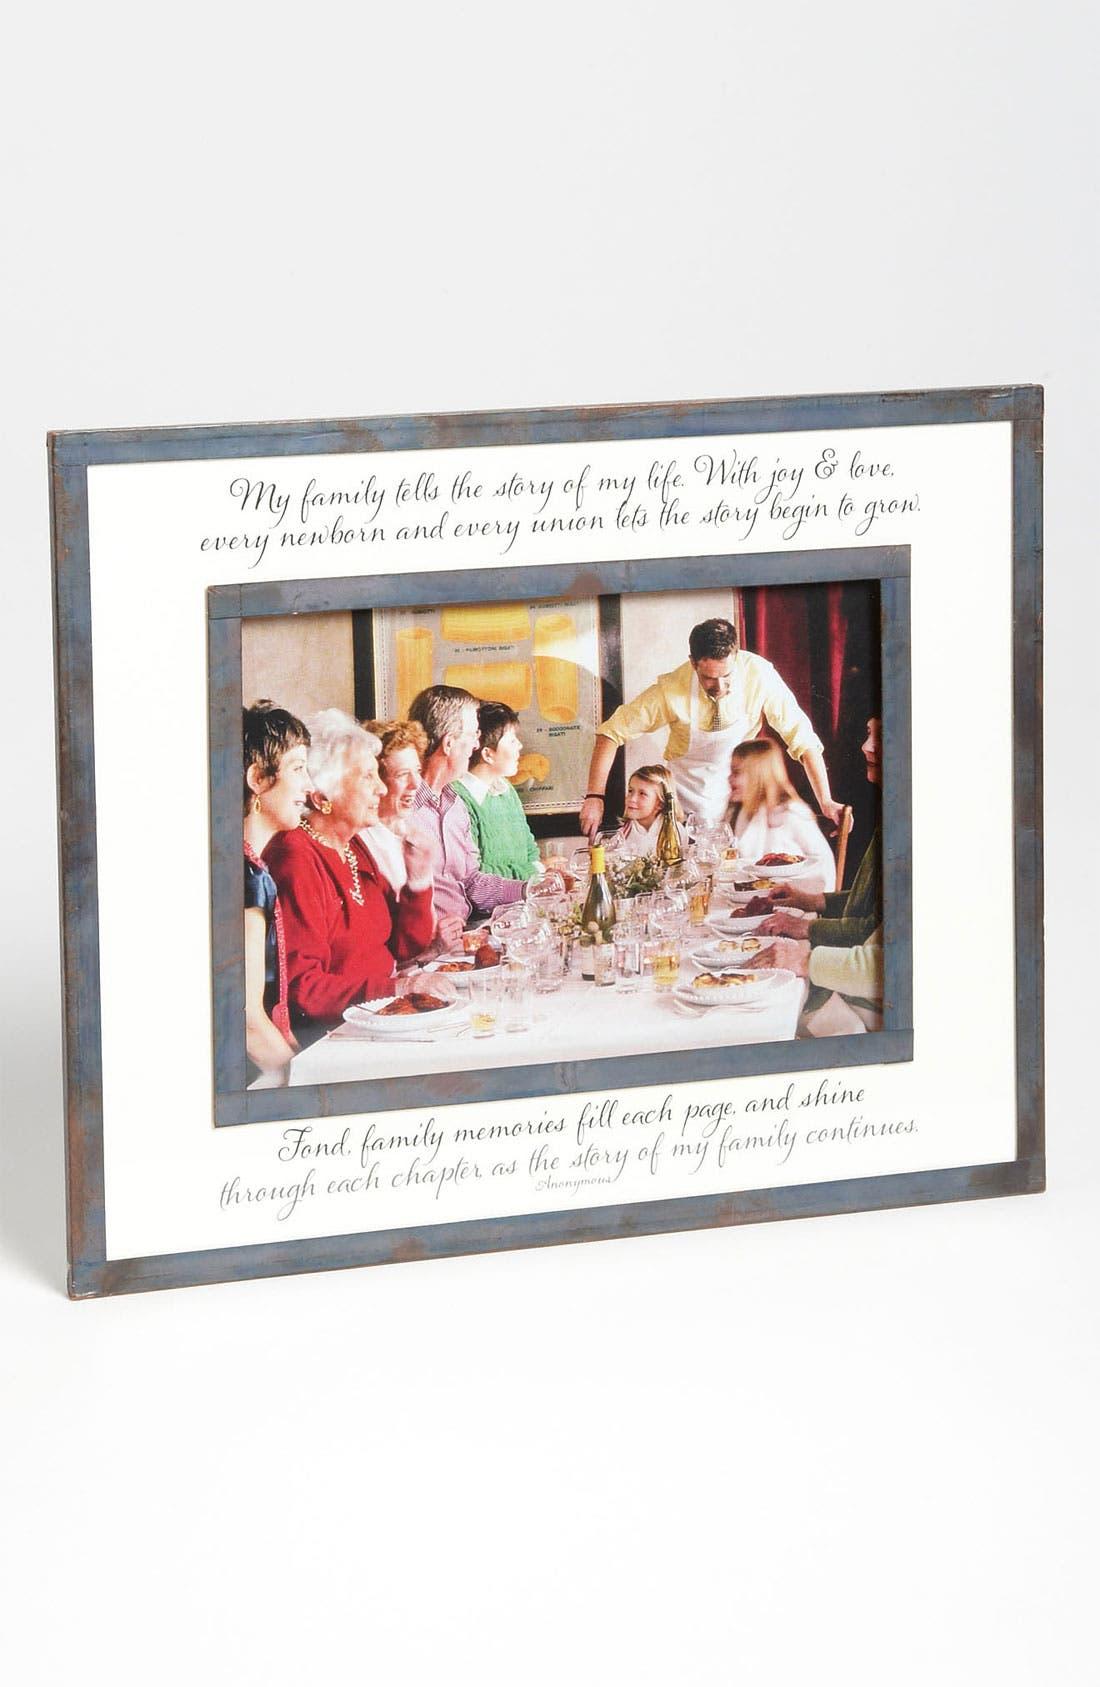 Alternate Image 1 Selected - Ben's Garden 'Family Tells The Story' Picture Frame